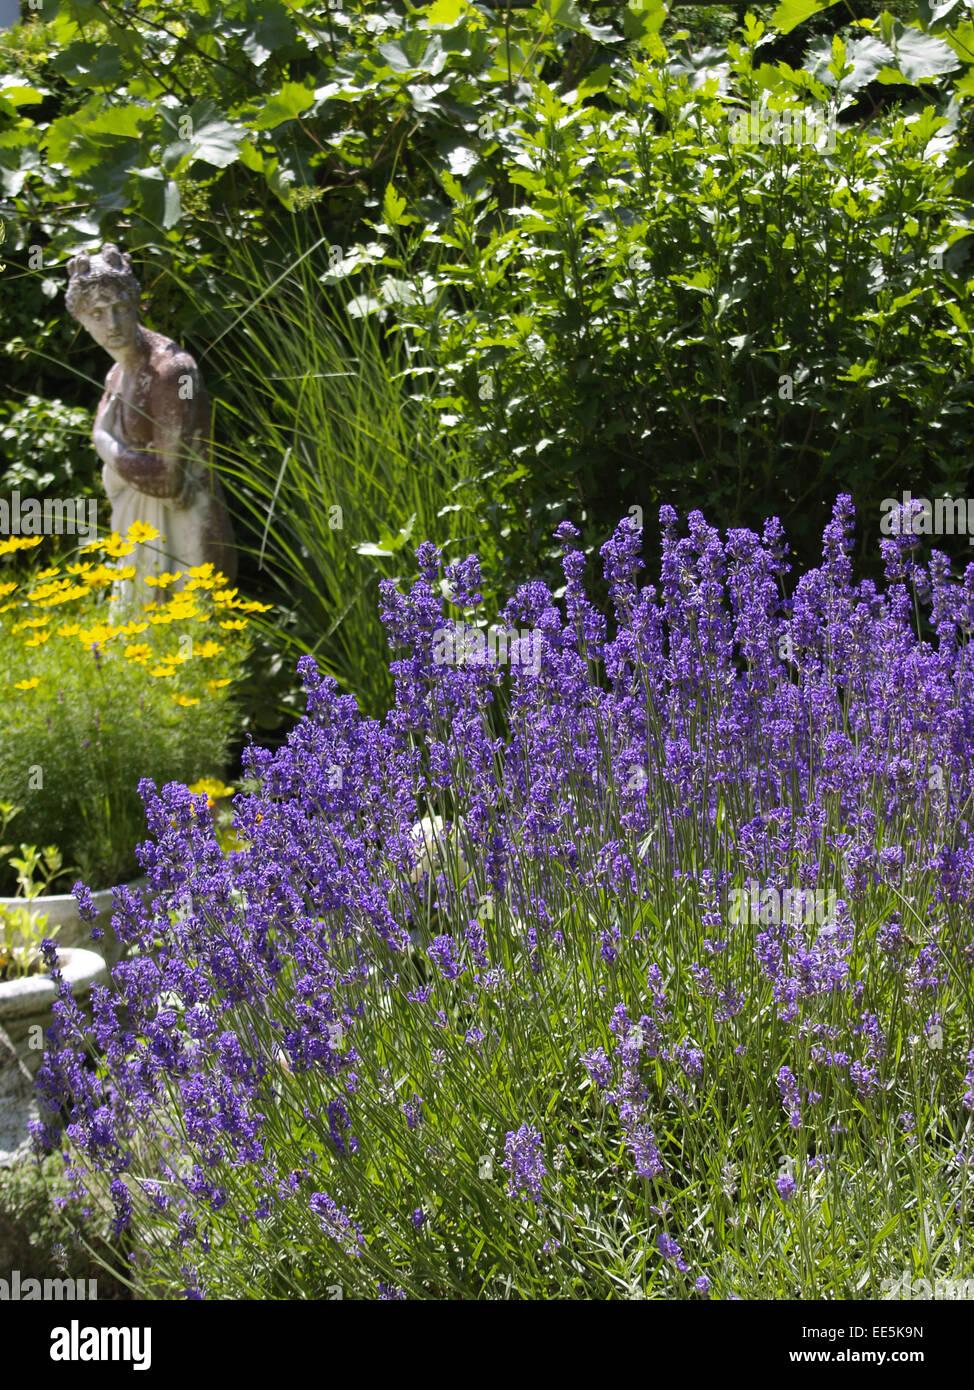 Aroma Blume Blumen Blumengarten Blueten Duft Feld Garten